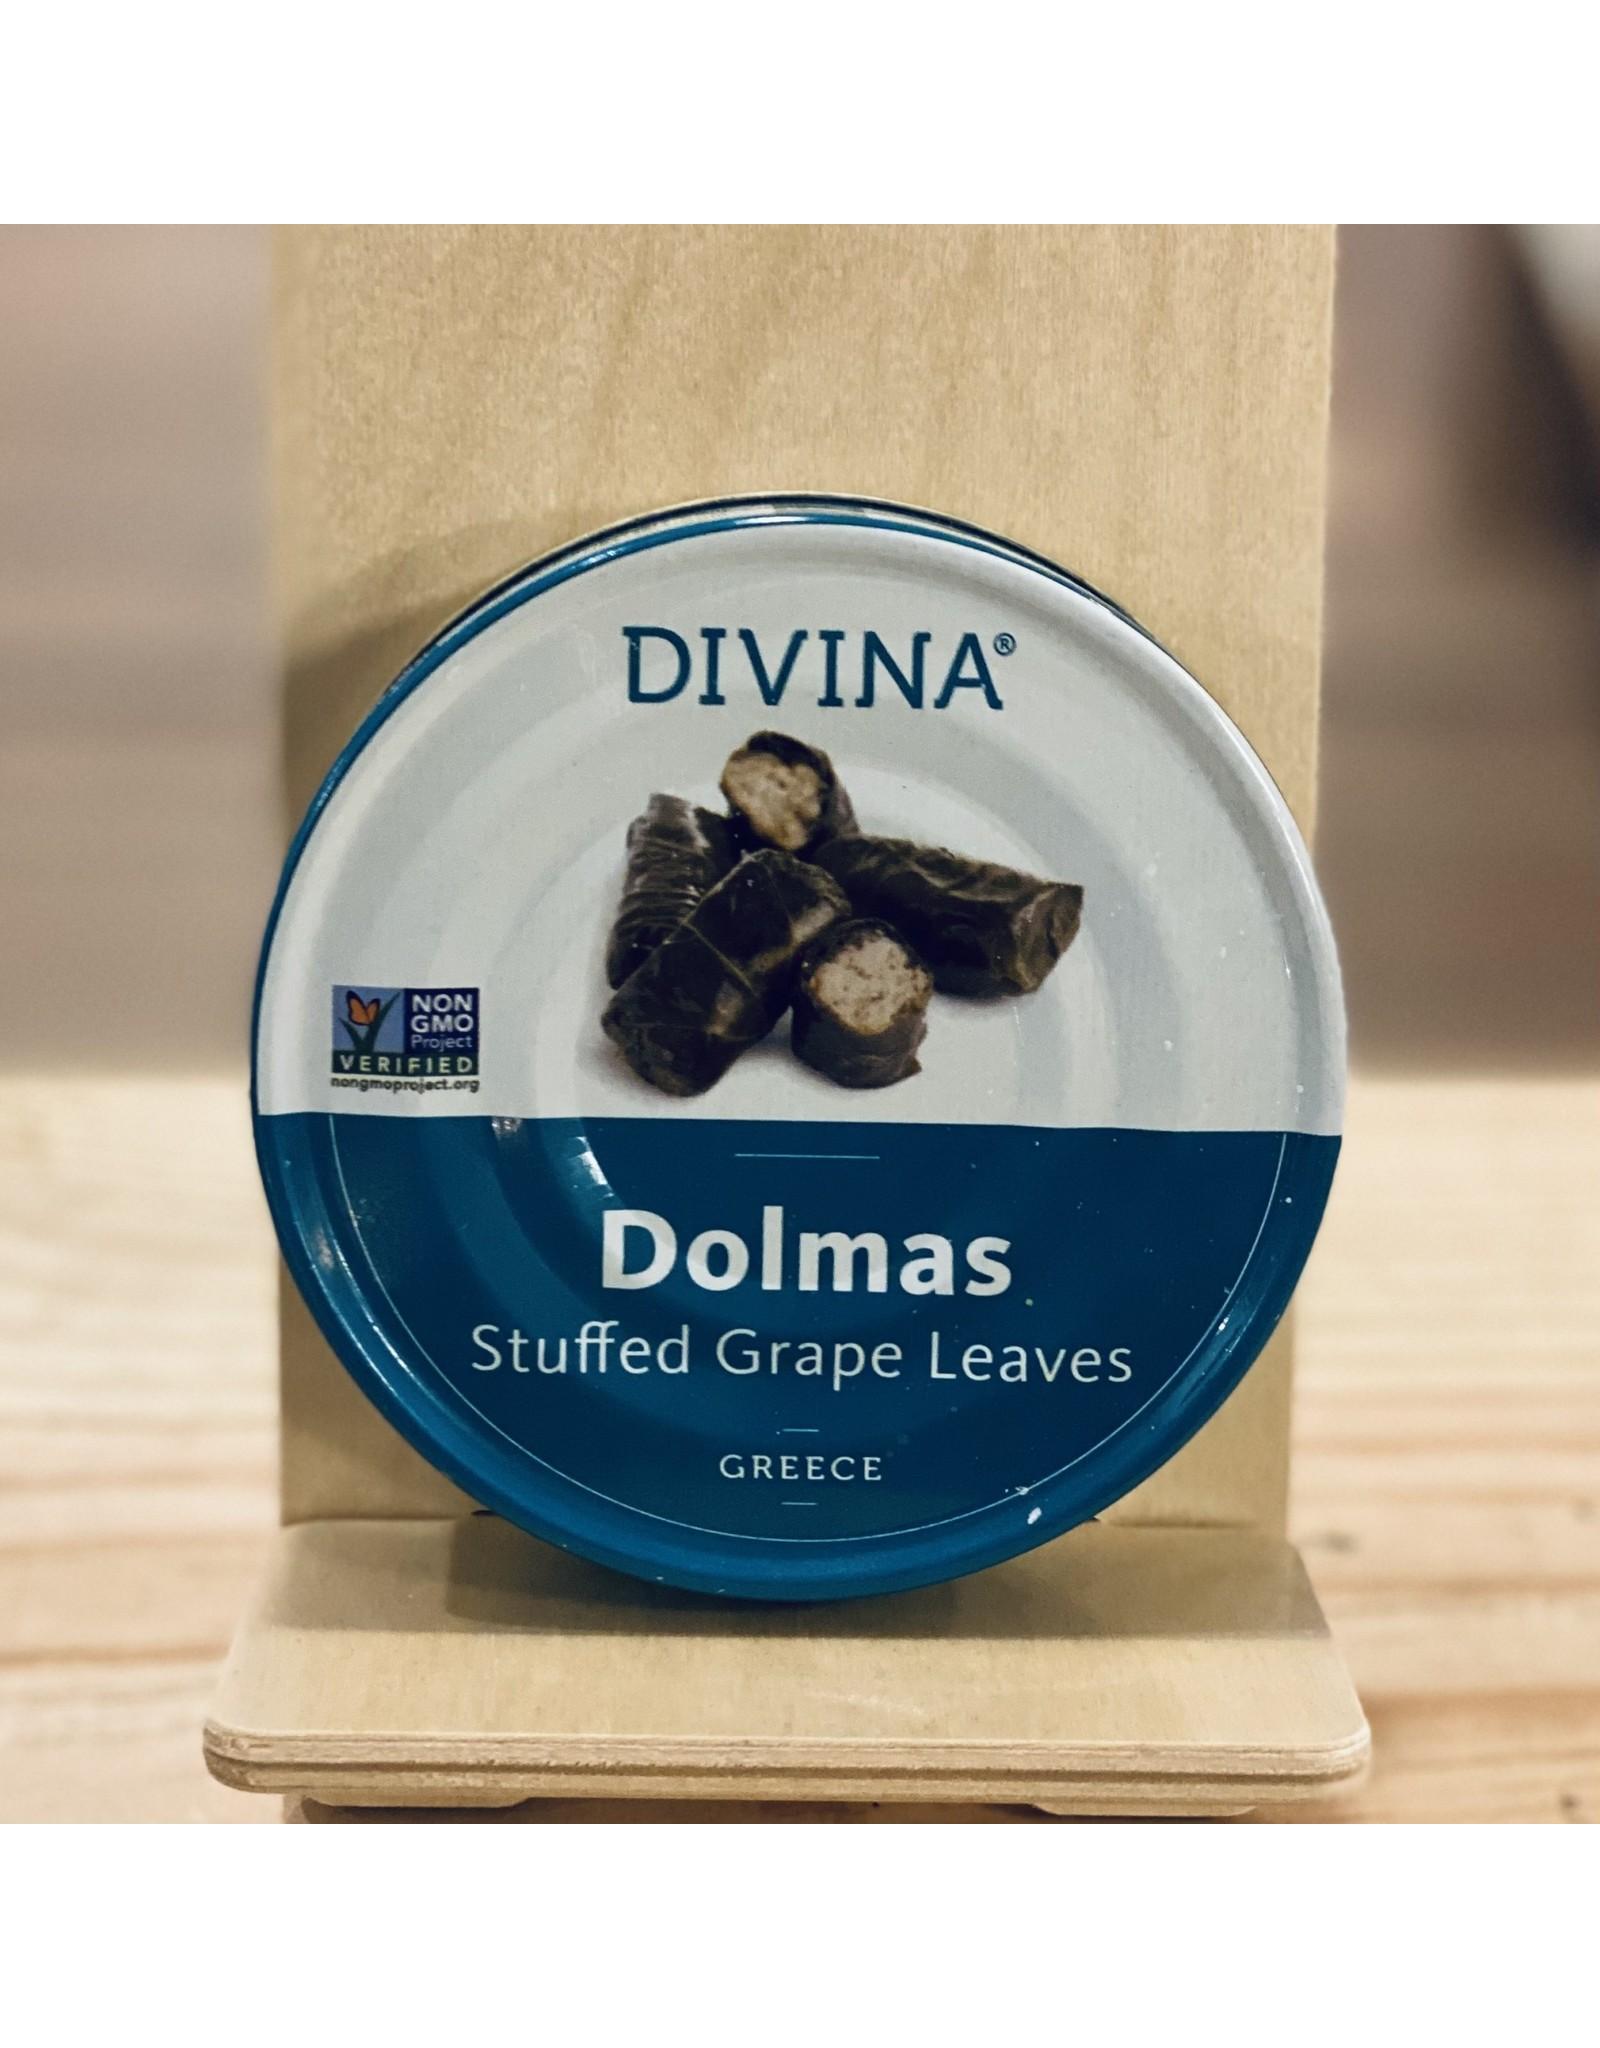 Divina Dolmas Stuffed Grape Leaves 7oz - Greece